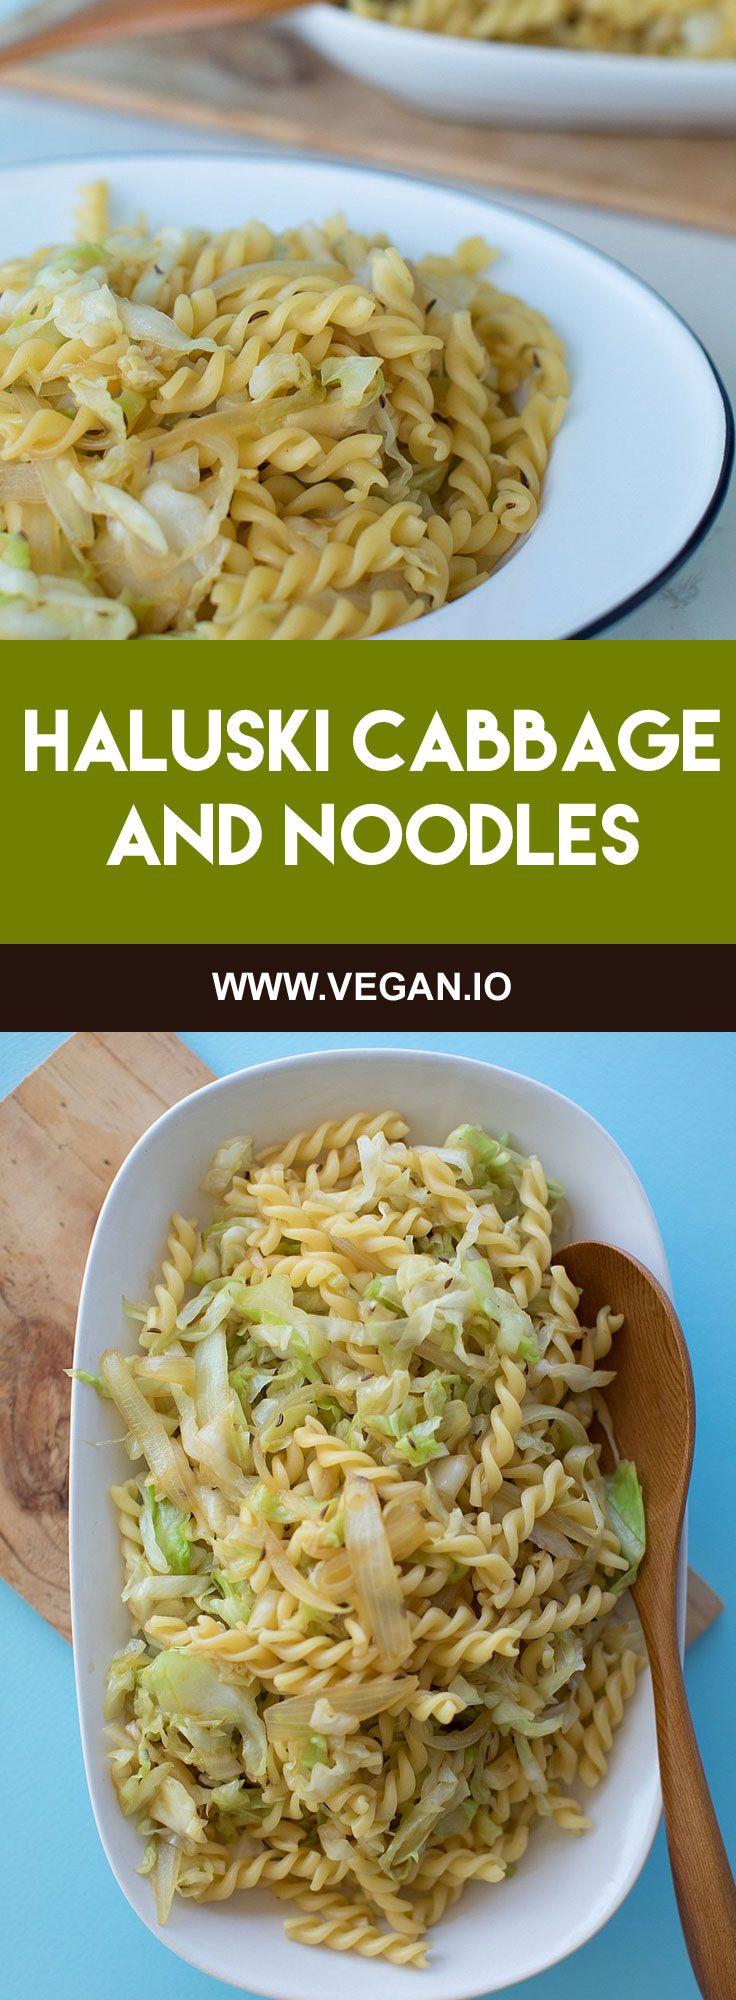 Haluski Cabbage and Noodles